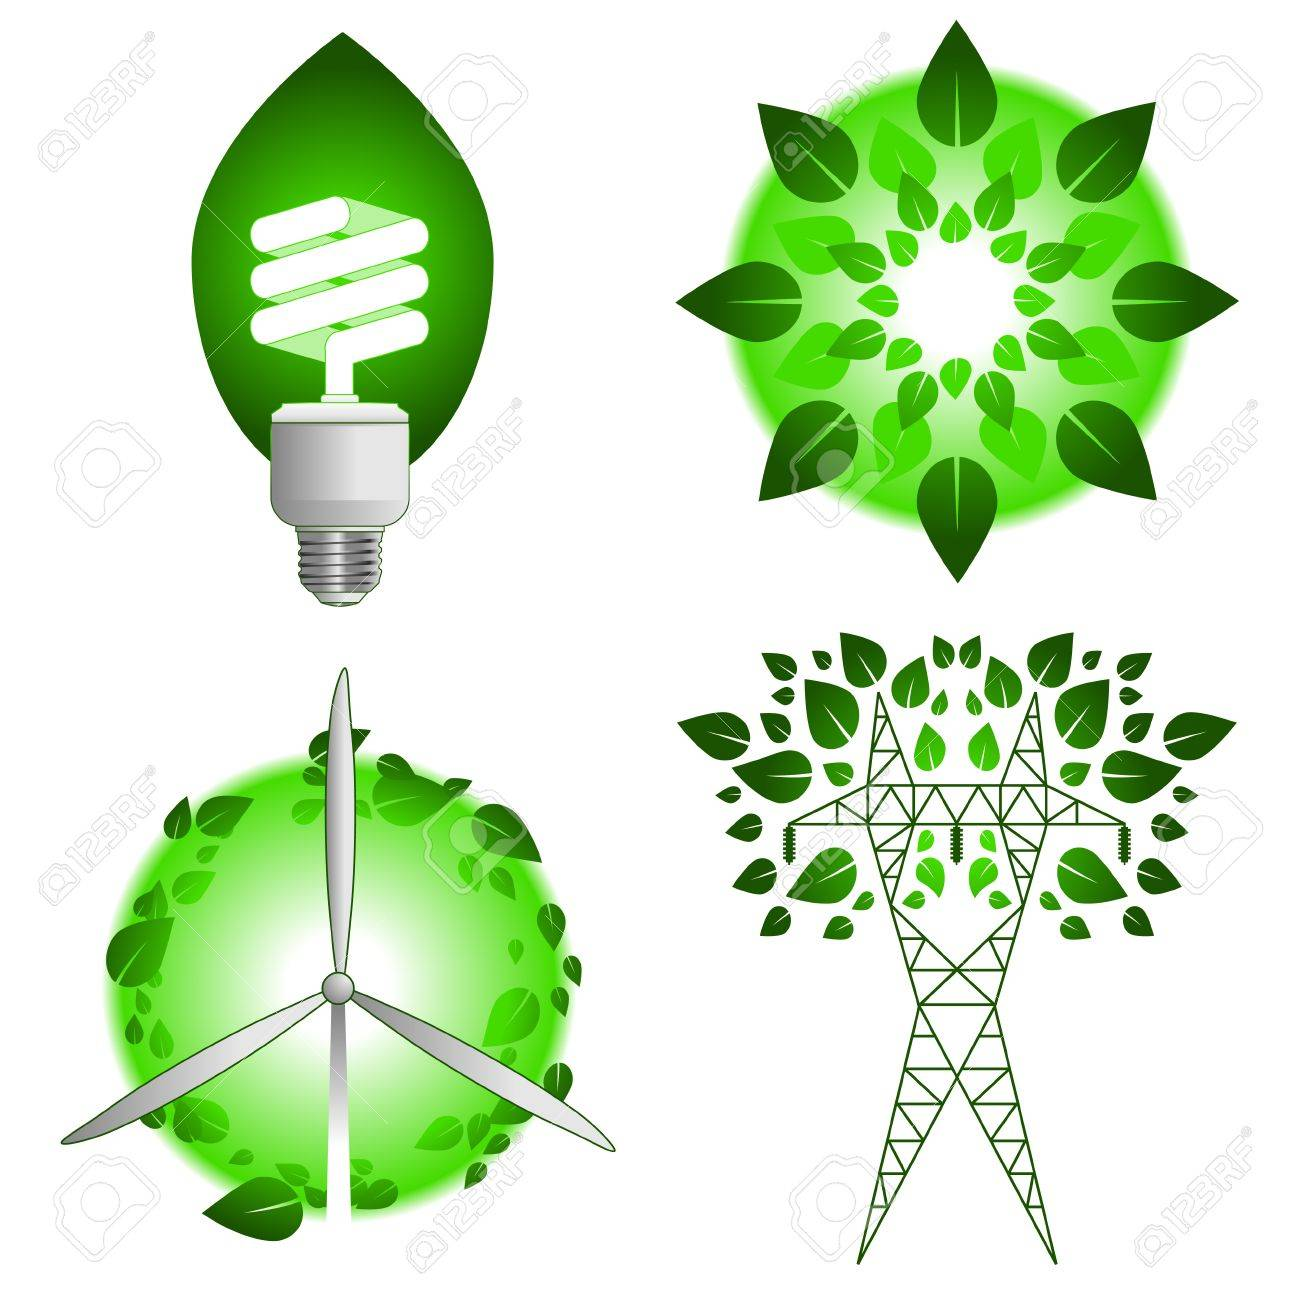 Green energy icons Stock Vector - 4982263